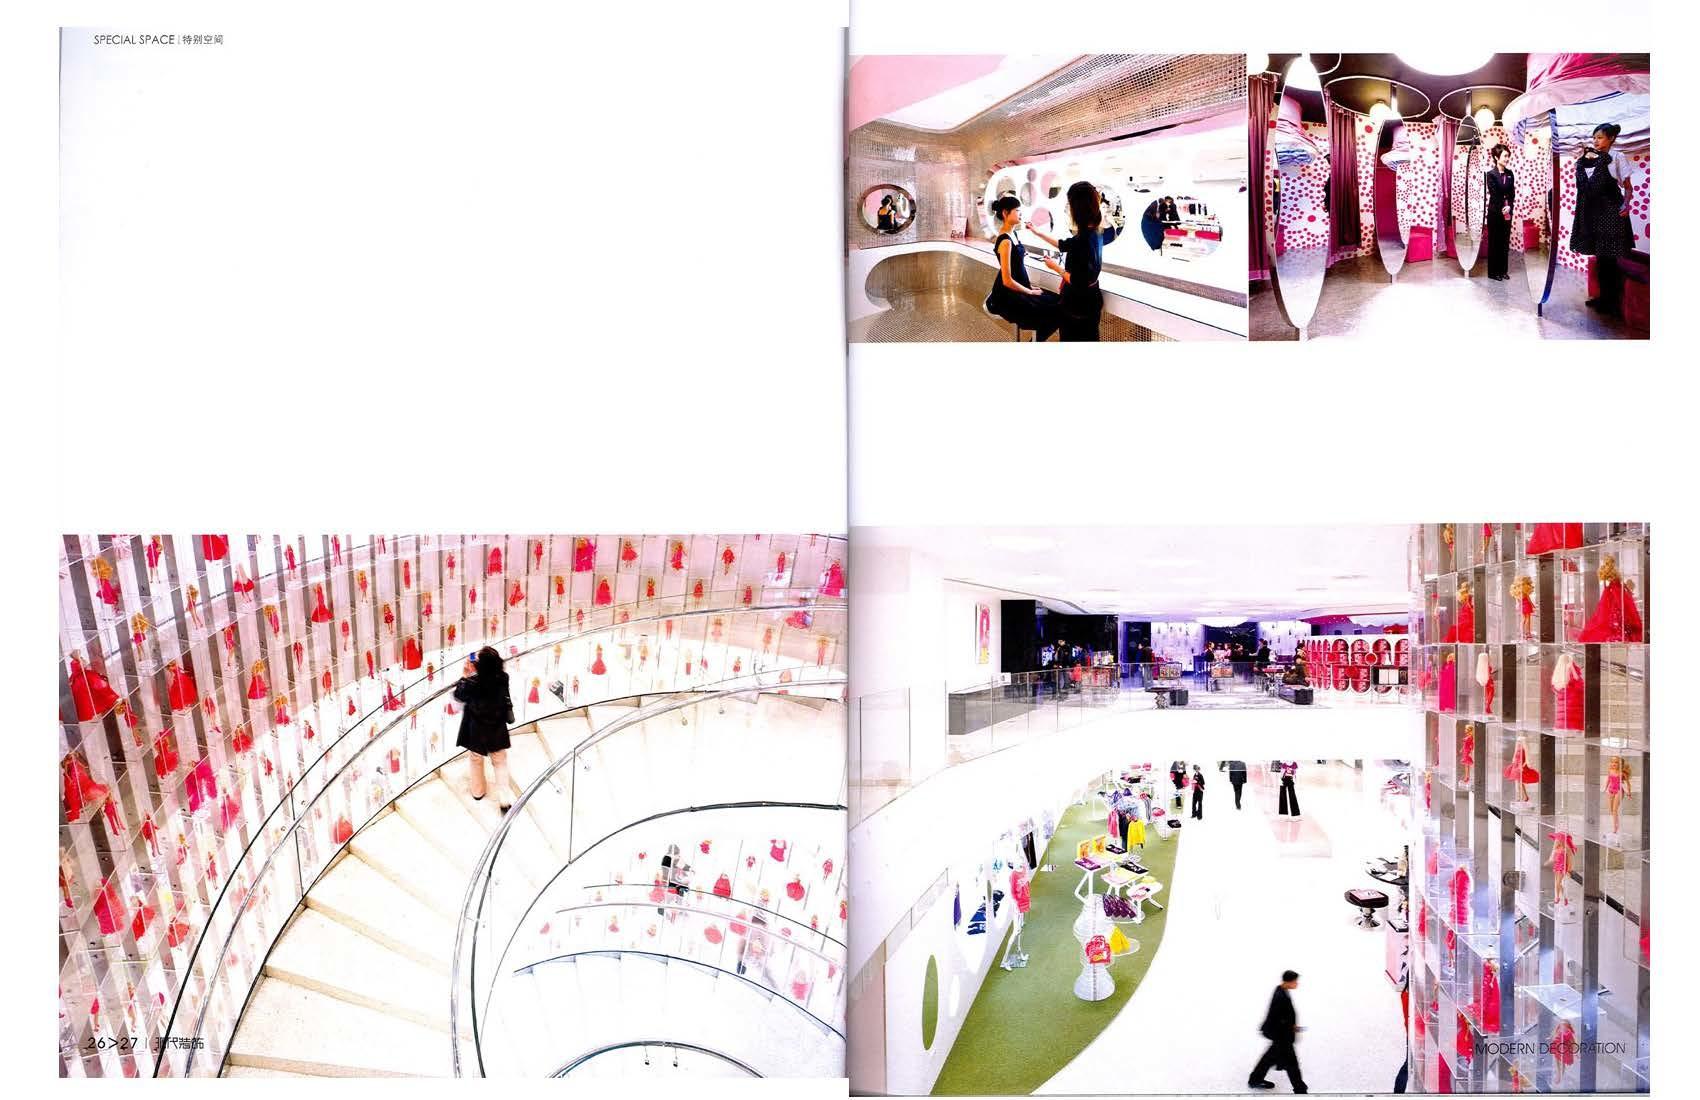 moderndecoration-barbie_Page_3.jpg